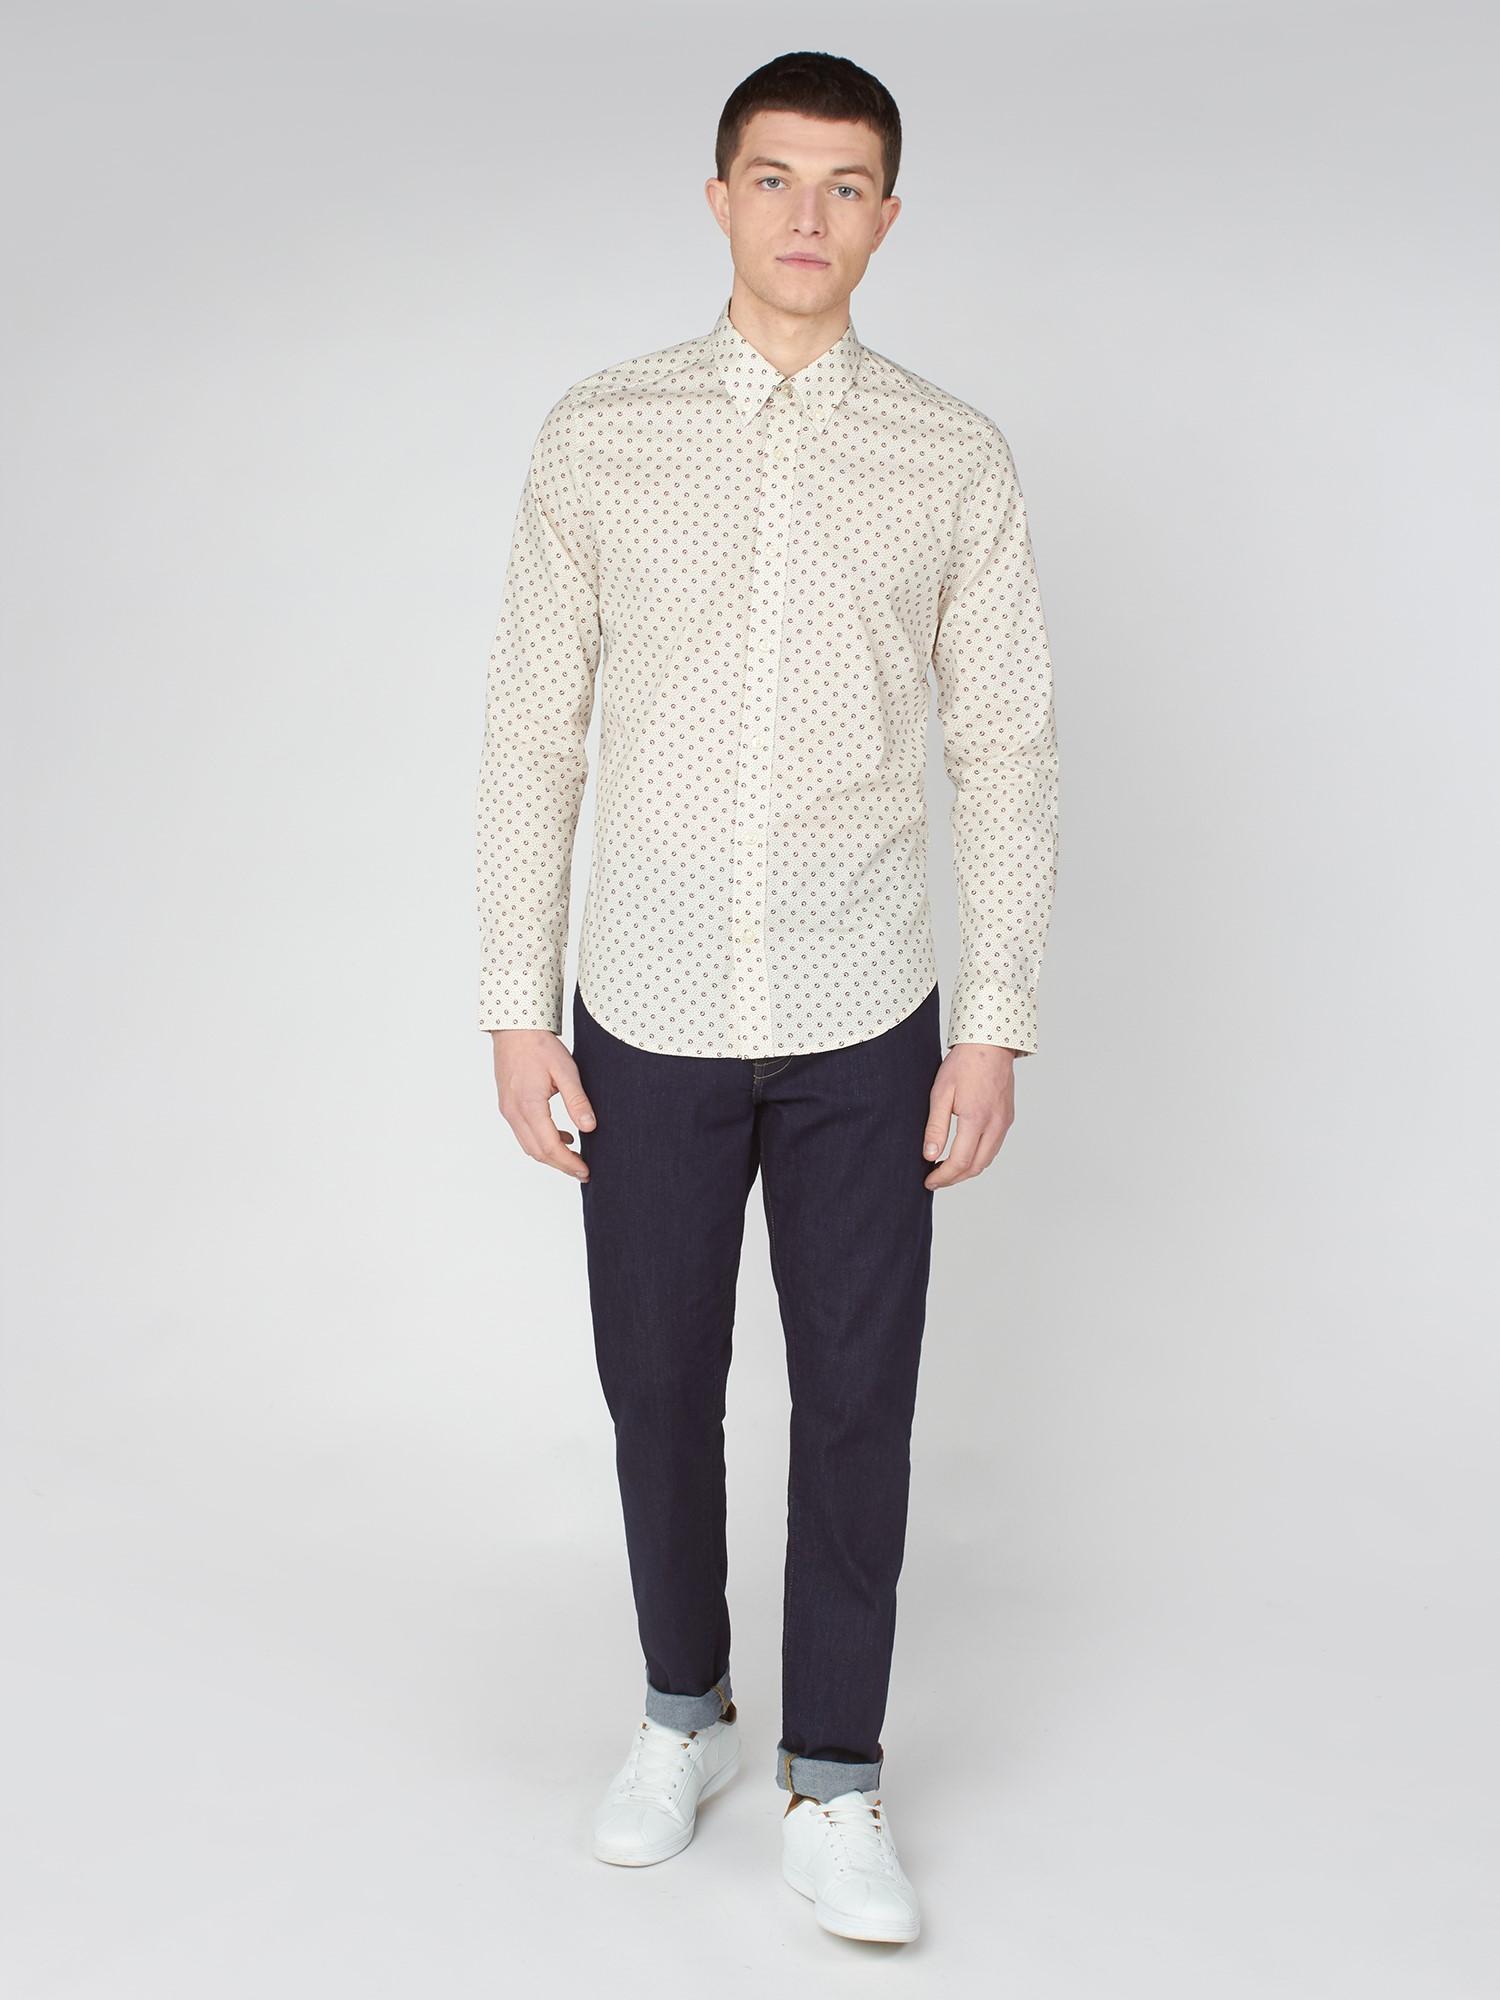 Target Spot Print Shirt